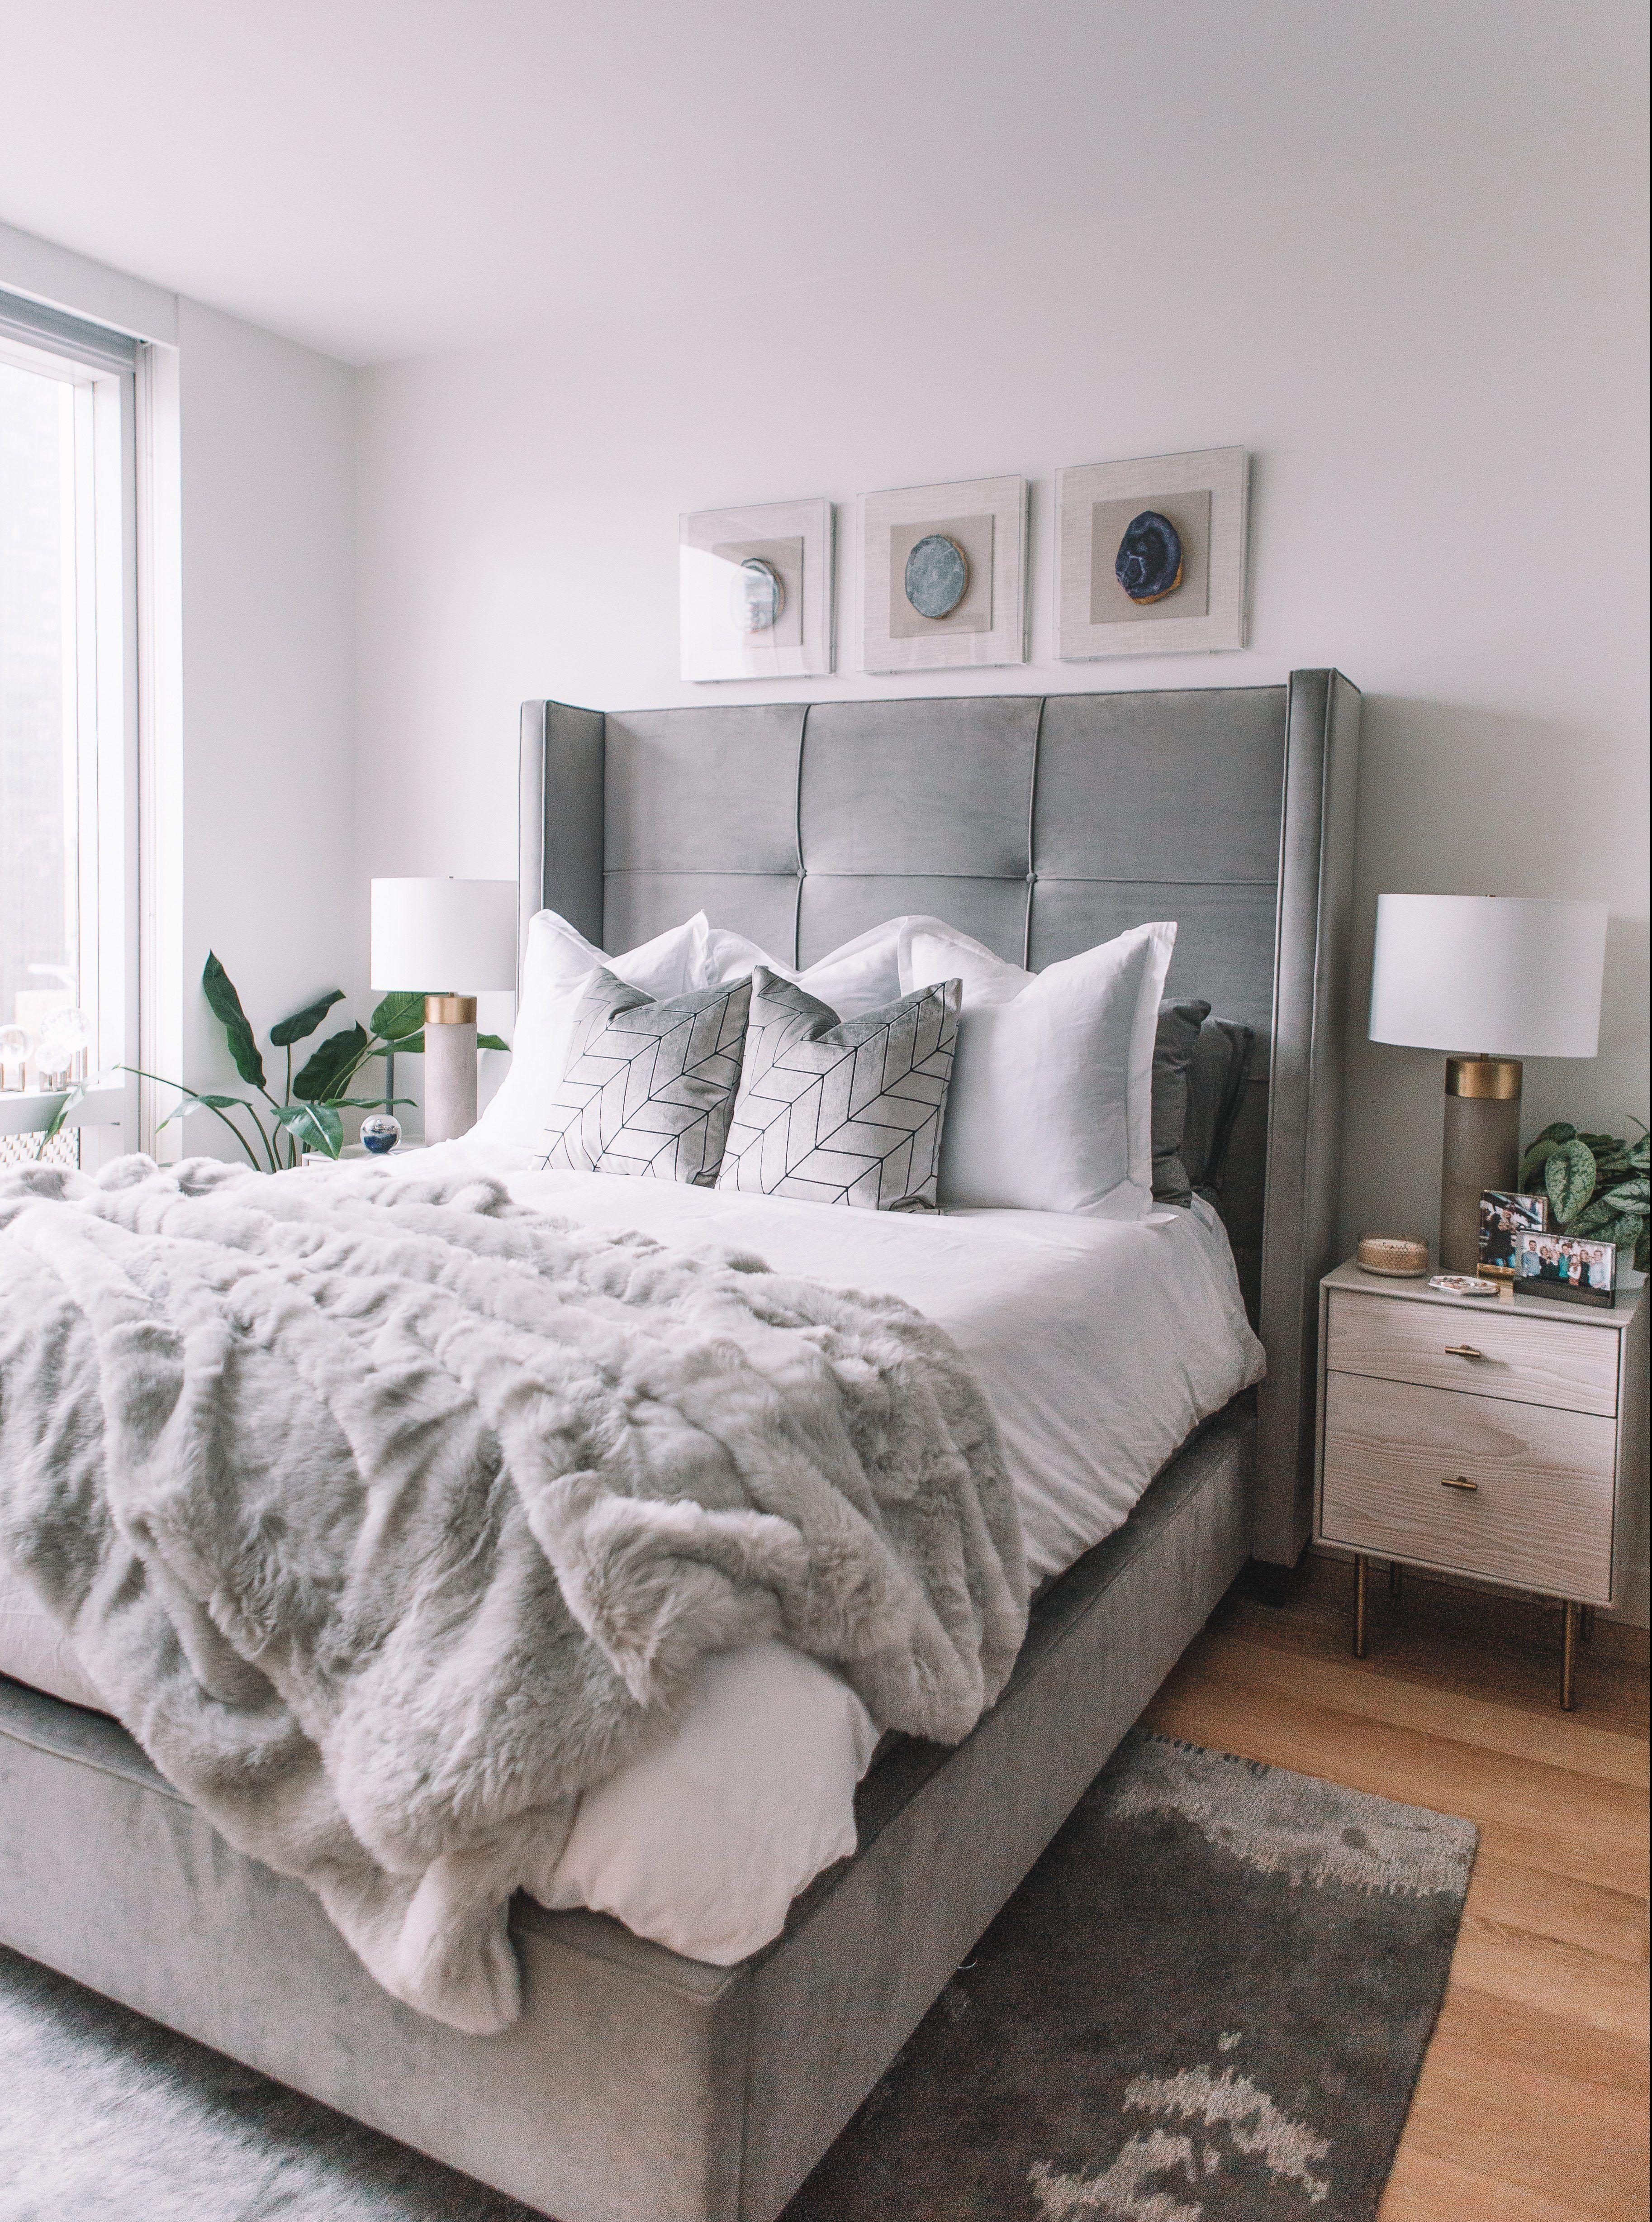 Nyc Bedroom Tour Grey Bed Frame Bedroom Interior Dove Grey Bedroom